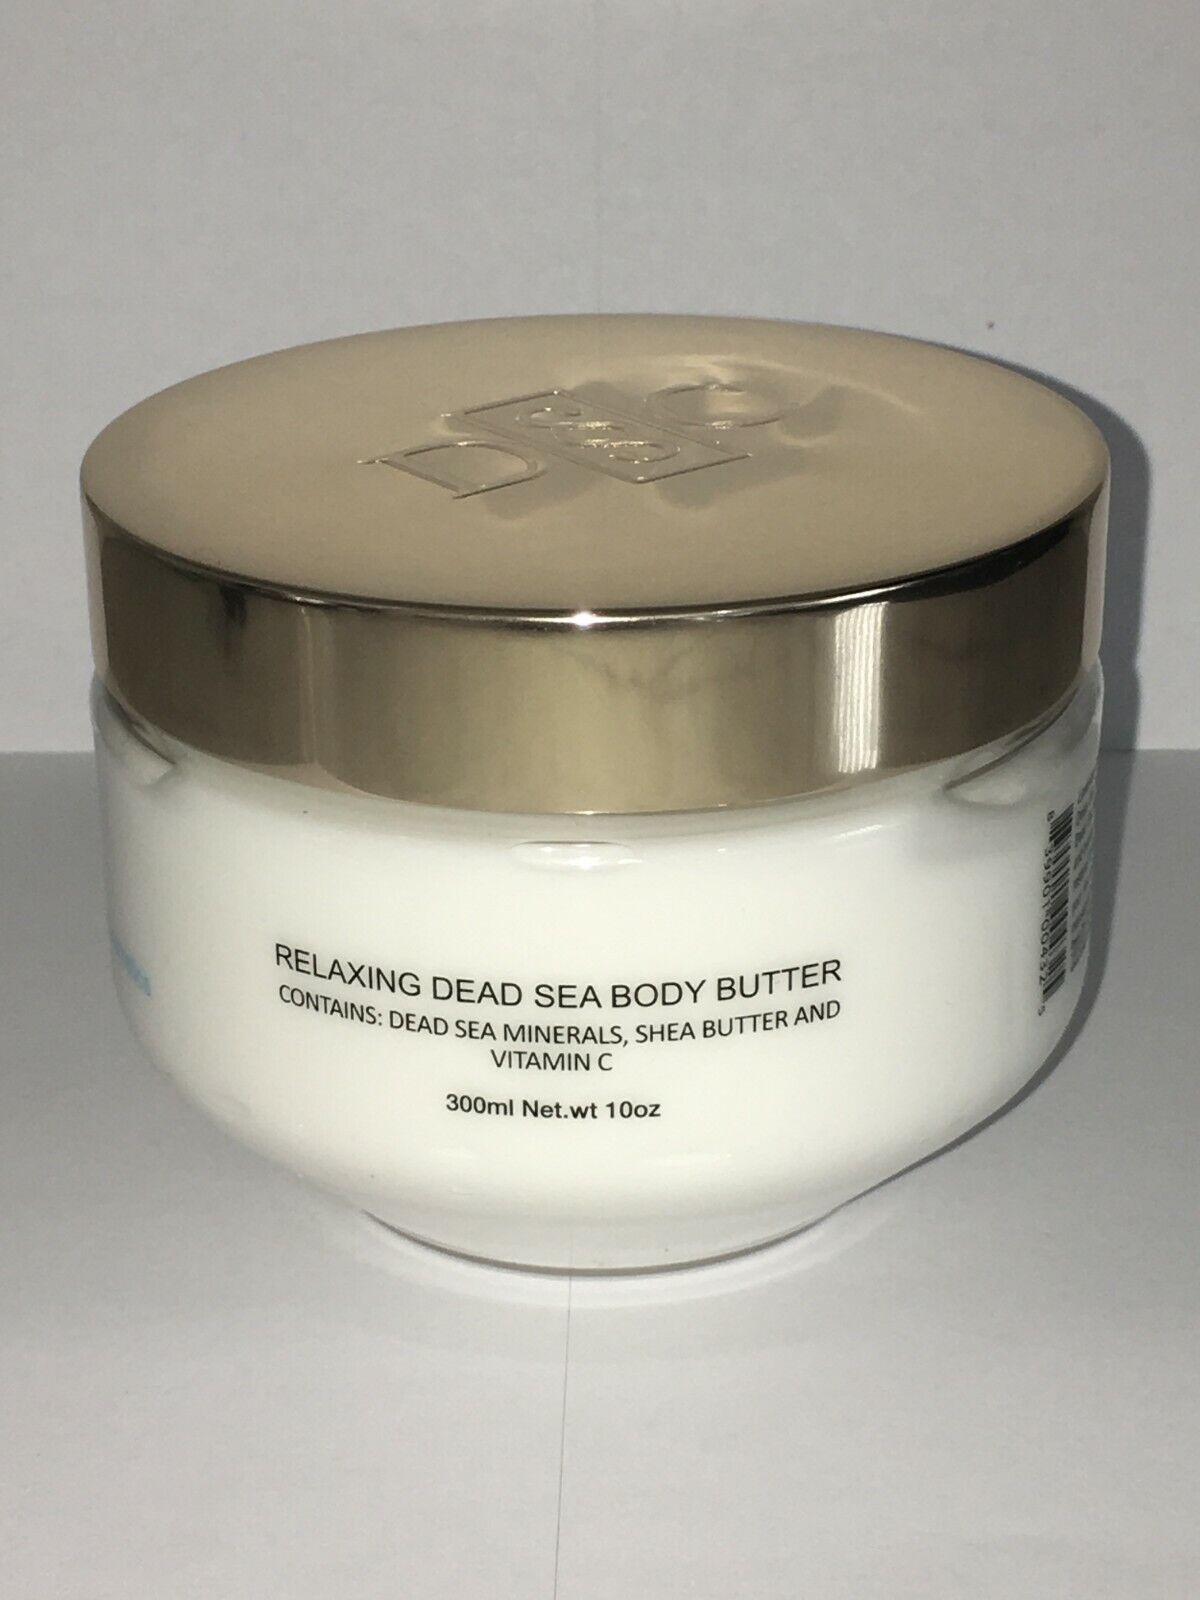 Dead sea minerals косметика купить сайт эйвон помада